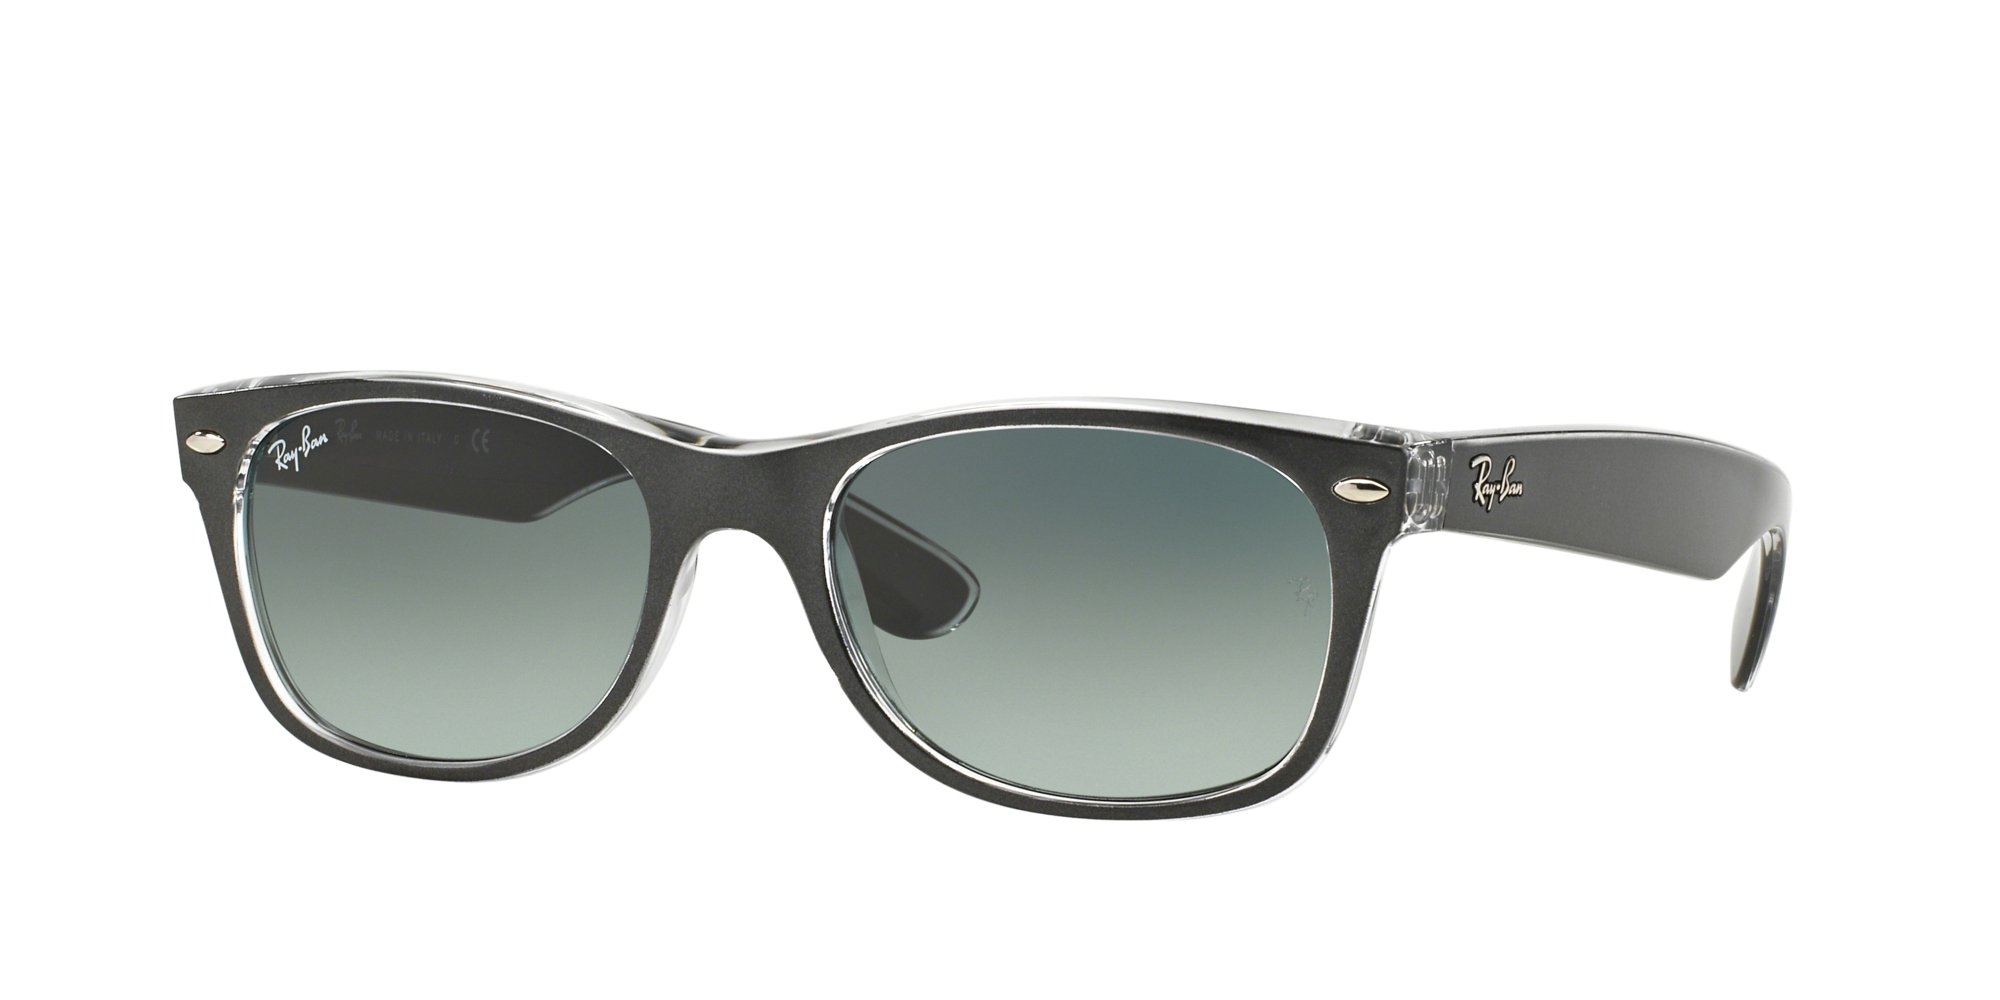 Ray Ban RB2132 NEW WAYFARER 614371 52M Brushed Gunmetal On Transp/Grey Gradient Dark Grey Sunglasses For Men For Women by Ray-Ban